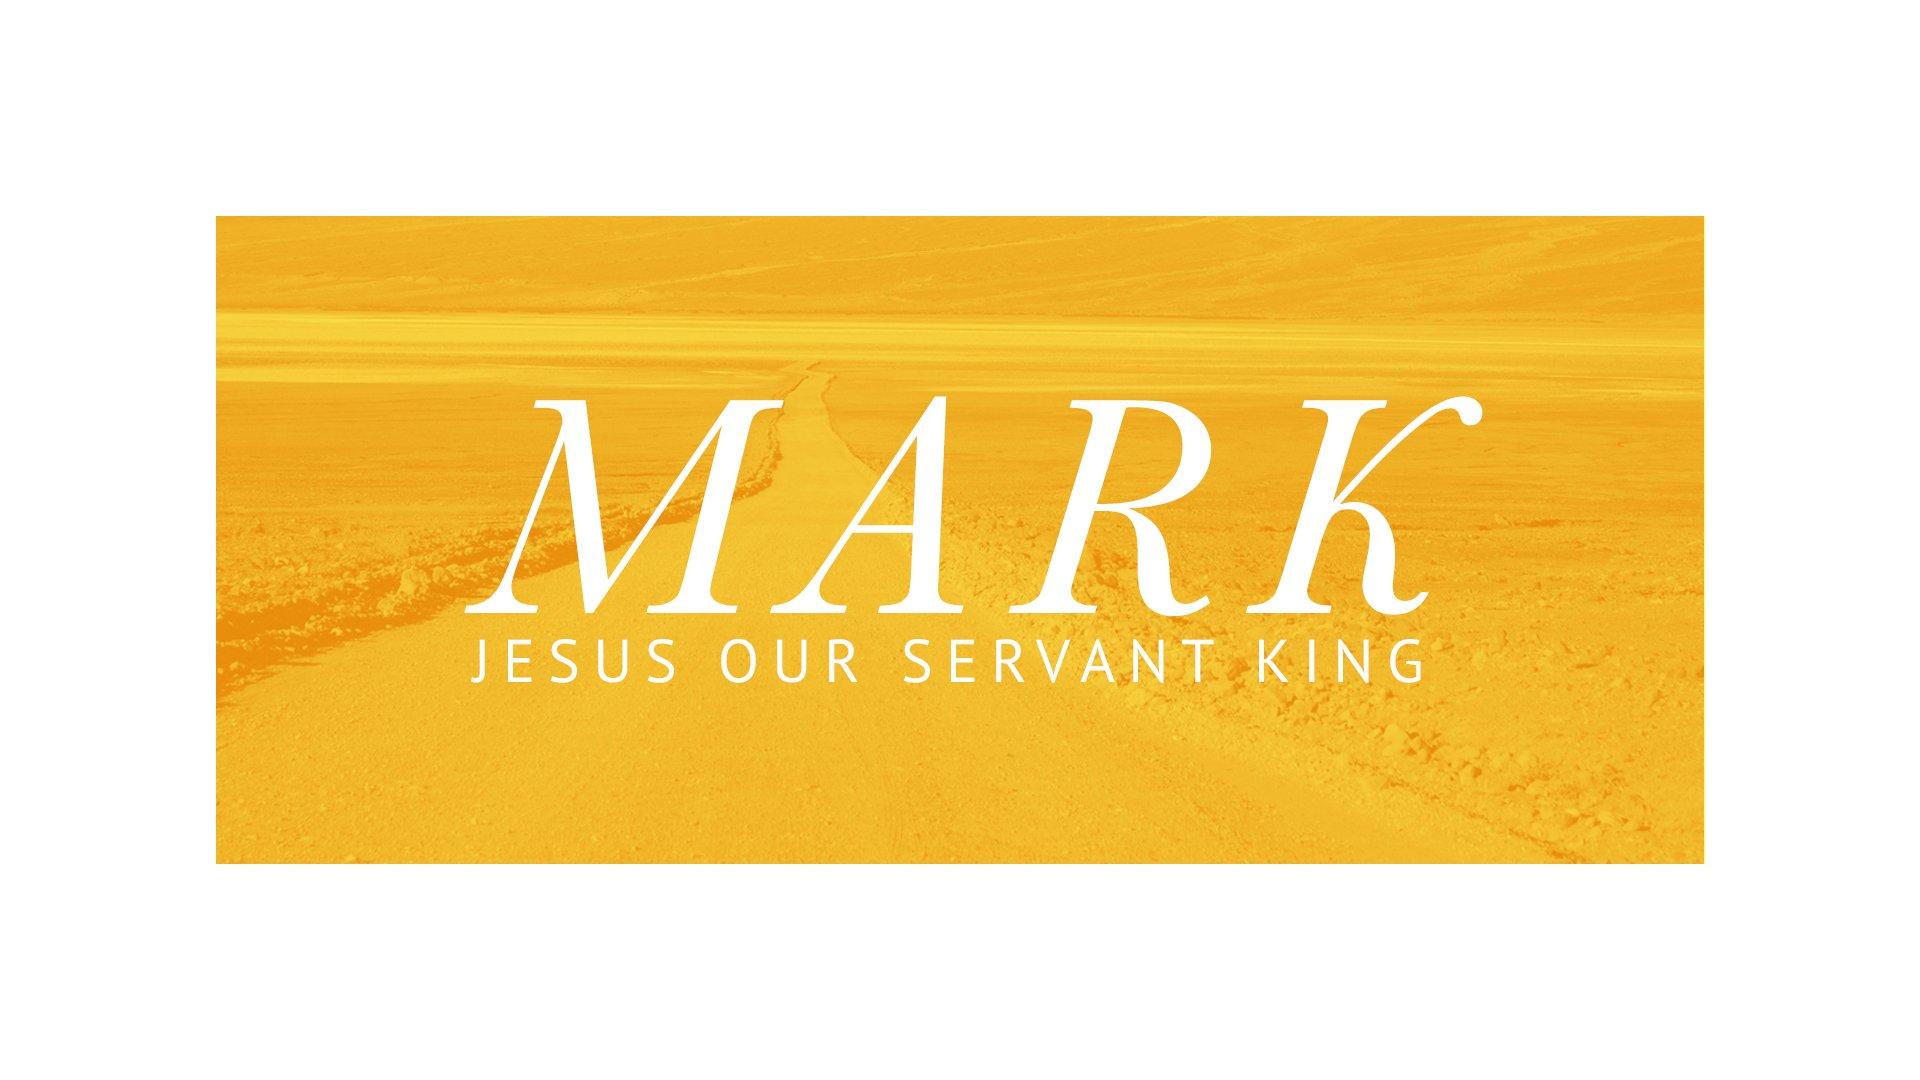 July 07, 2019 – The Gospel of Mark